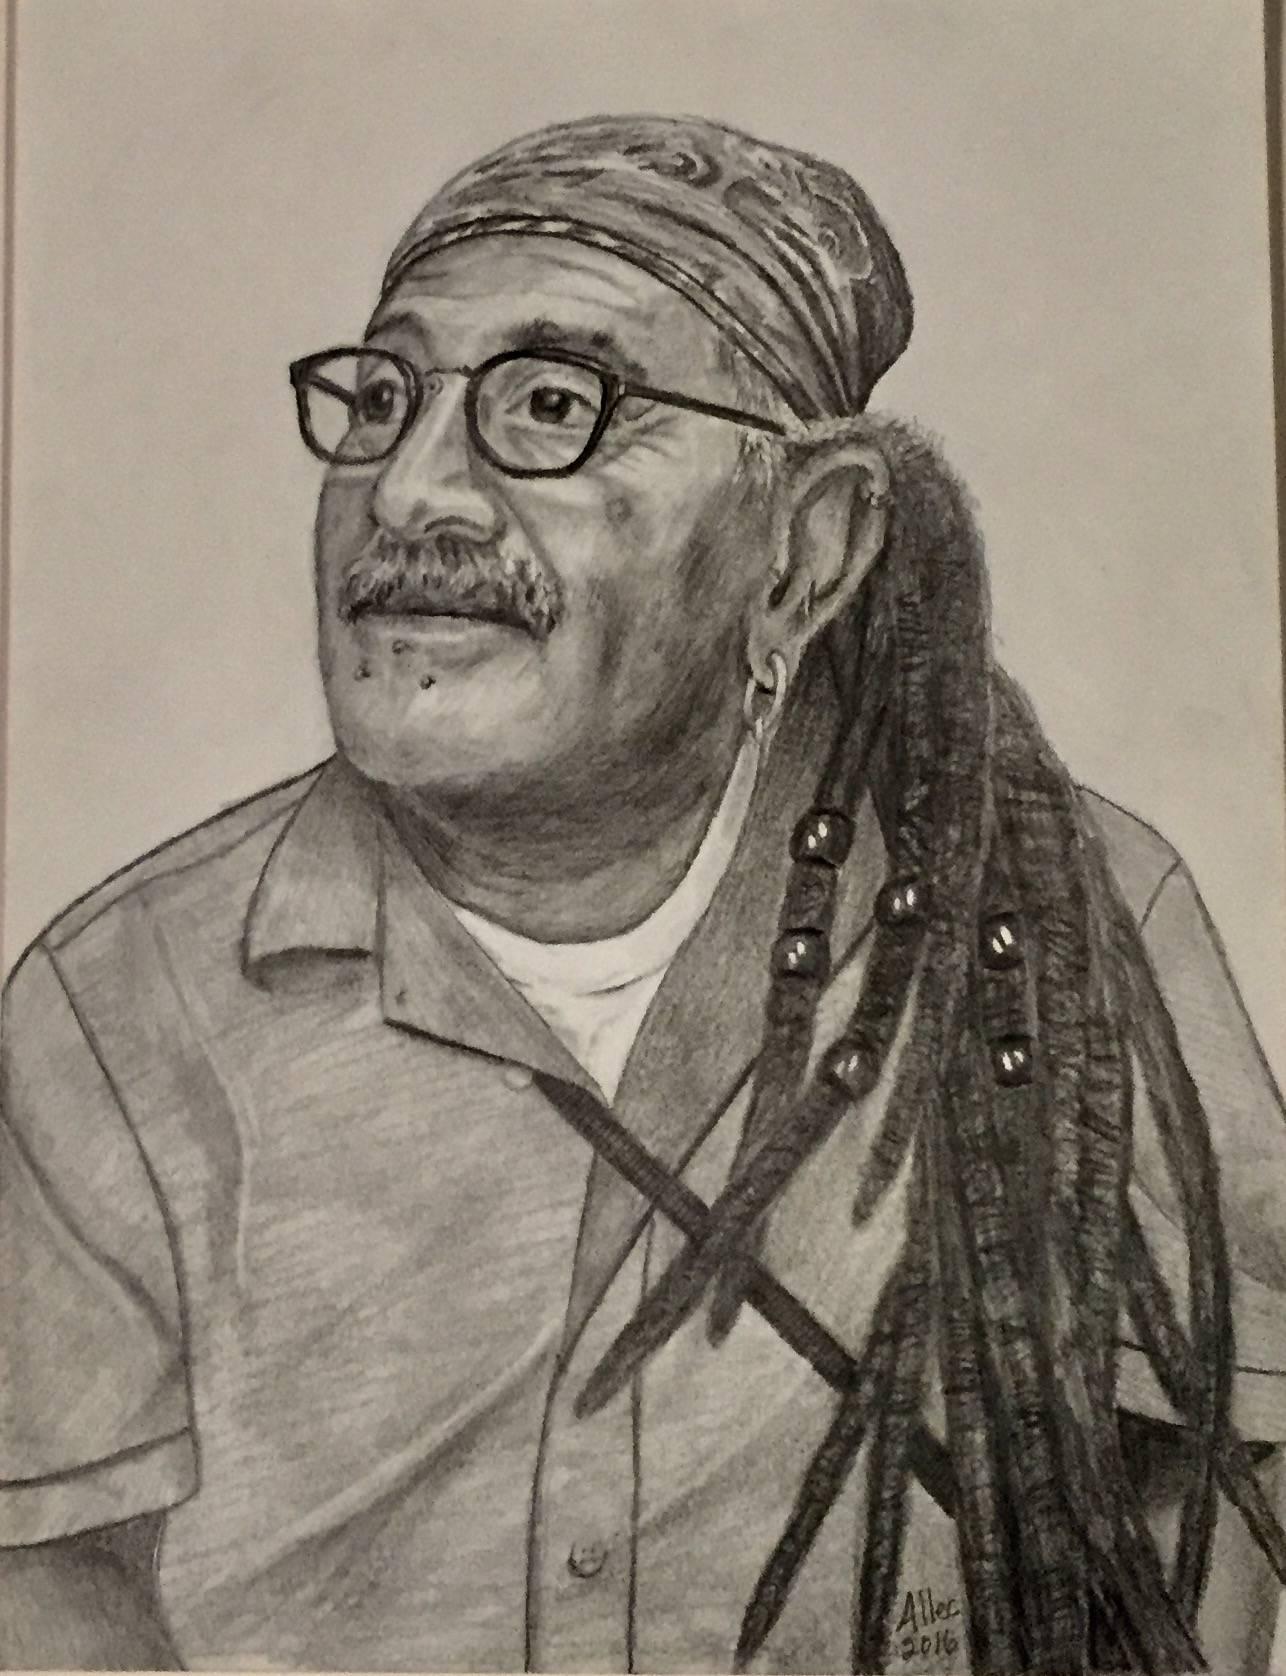 Portrait of a co-worker